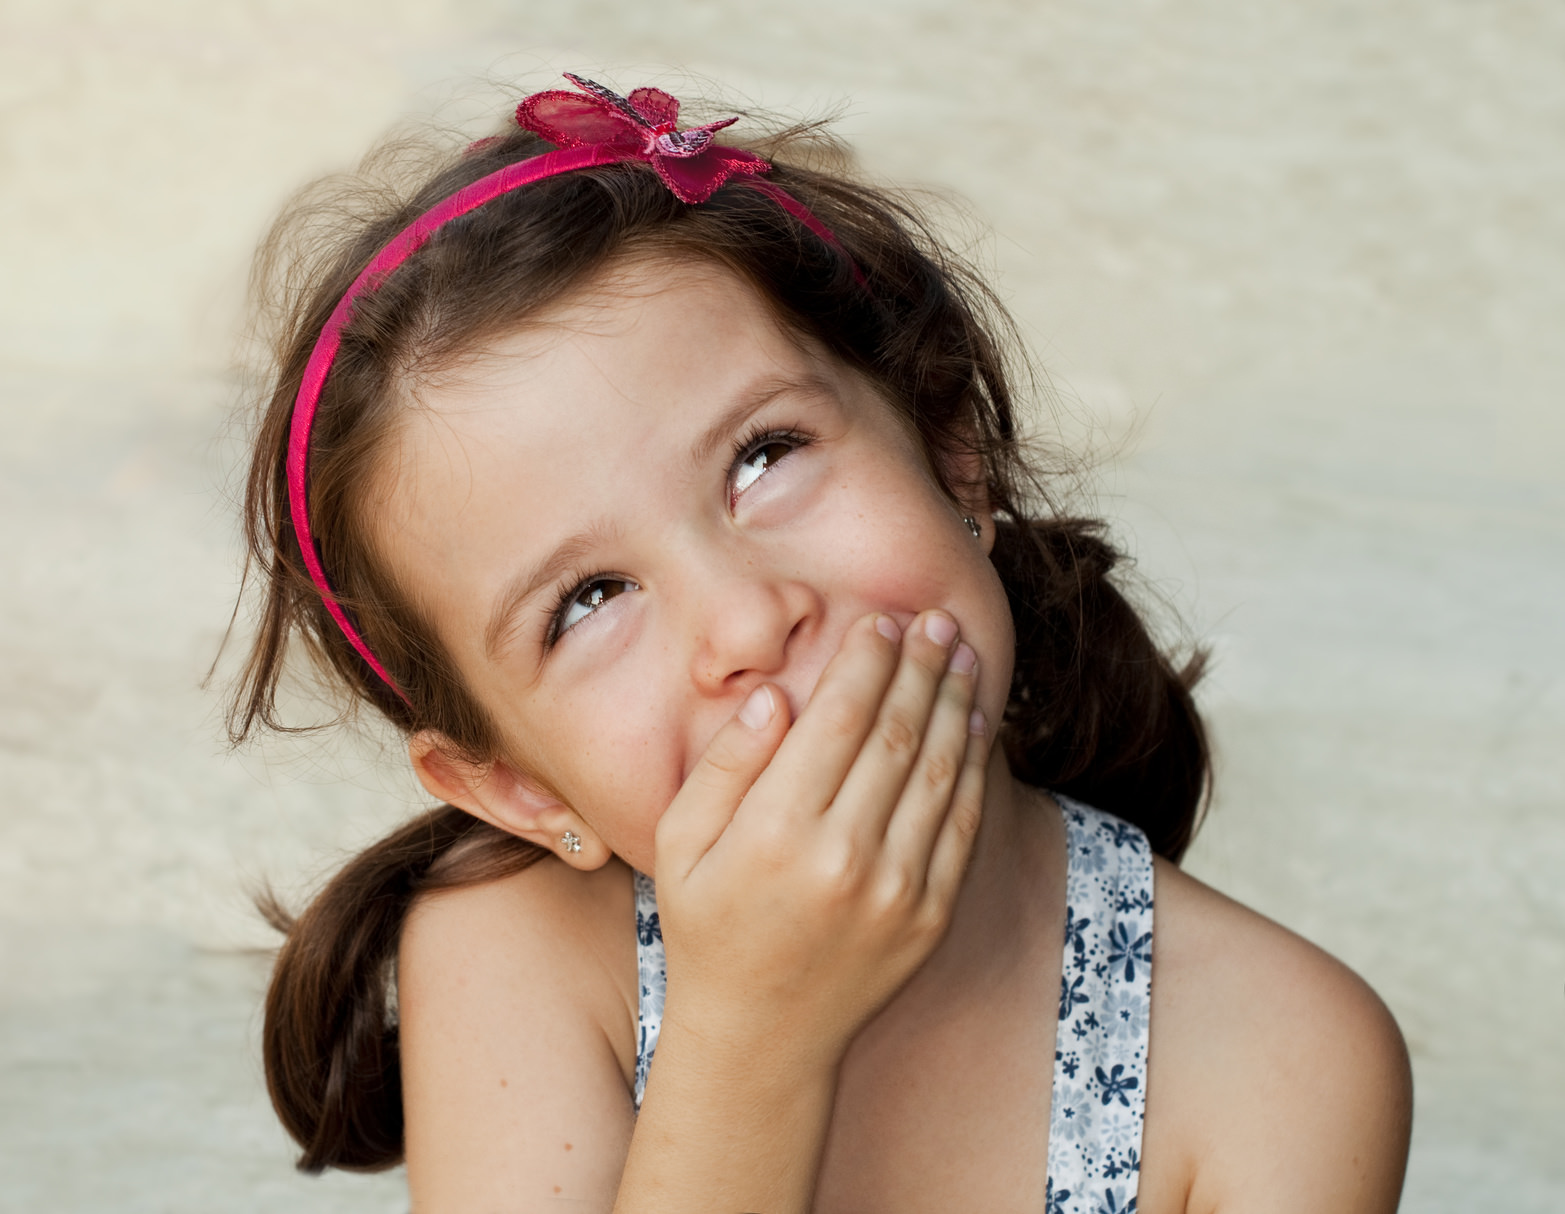 Девочка прикрывает рот